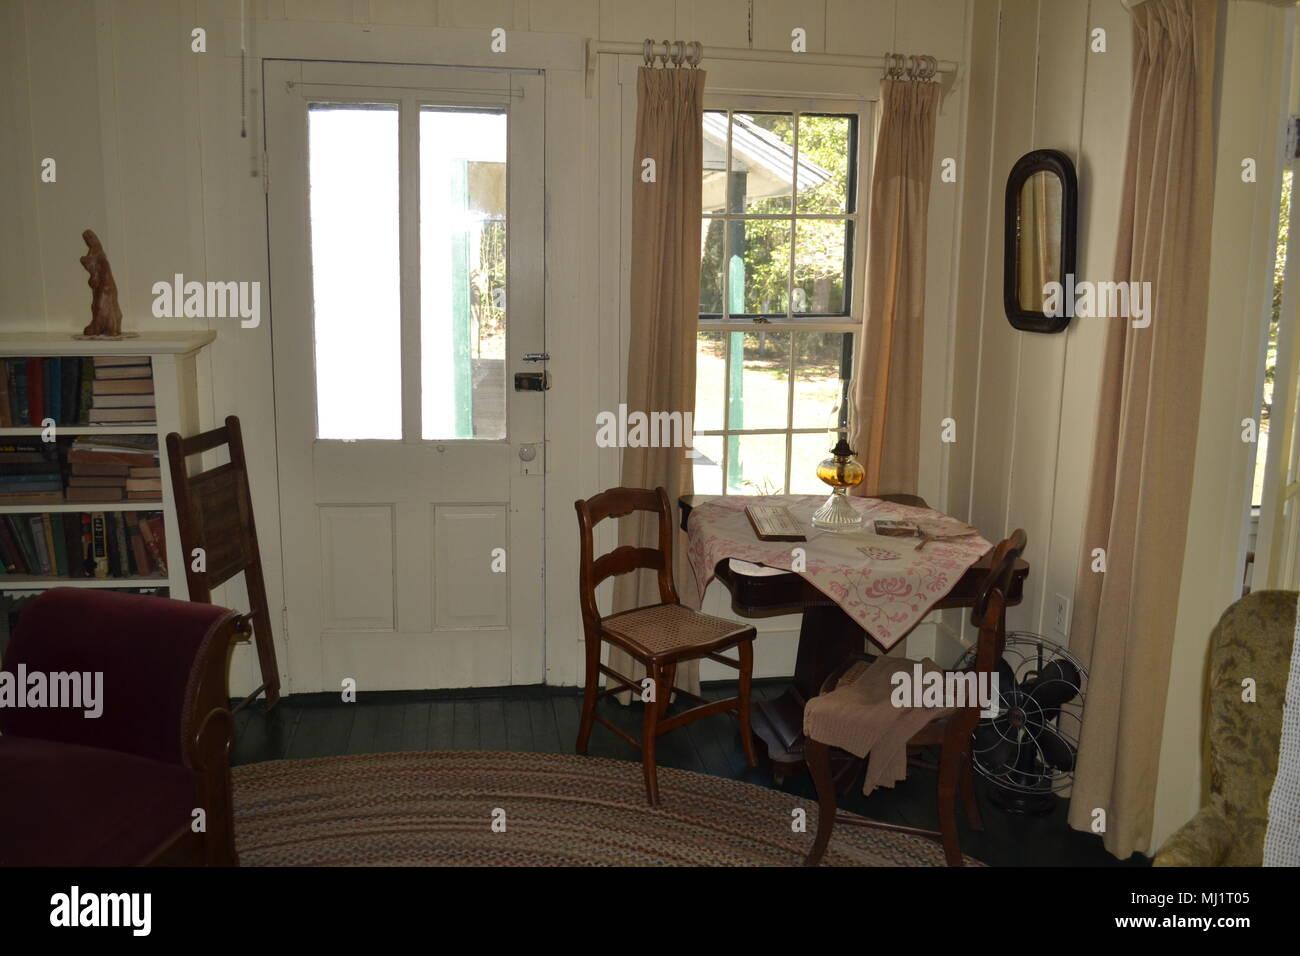 Antike Mobel In Alten Florida Cracker Haus Stockfoto Bild